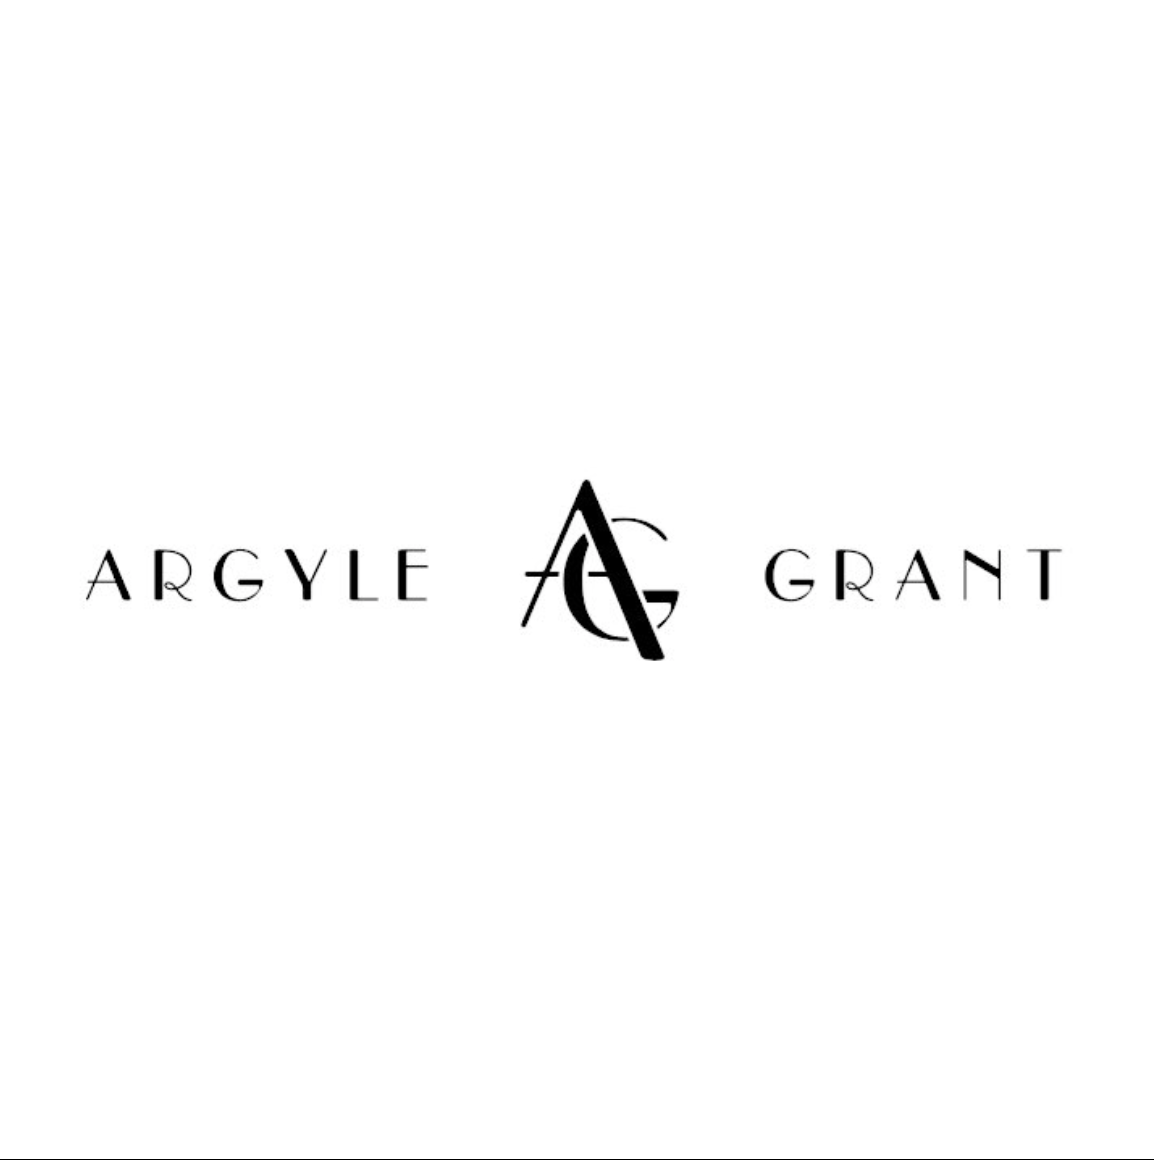 Argyle Grant